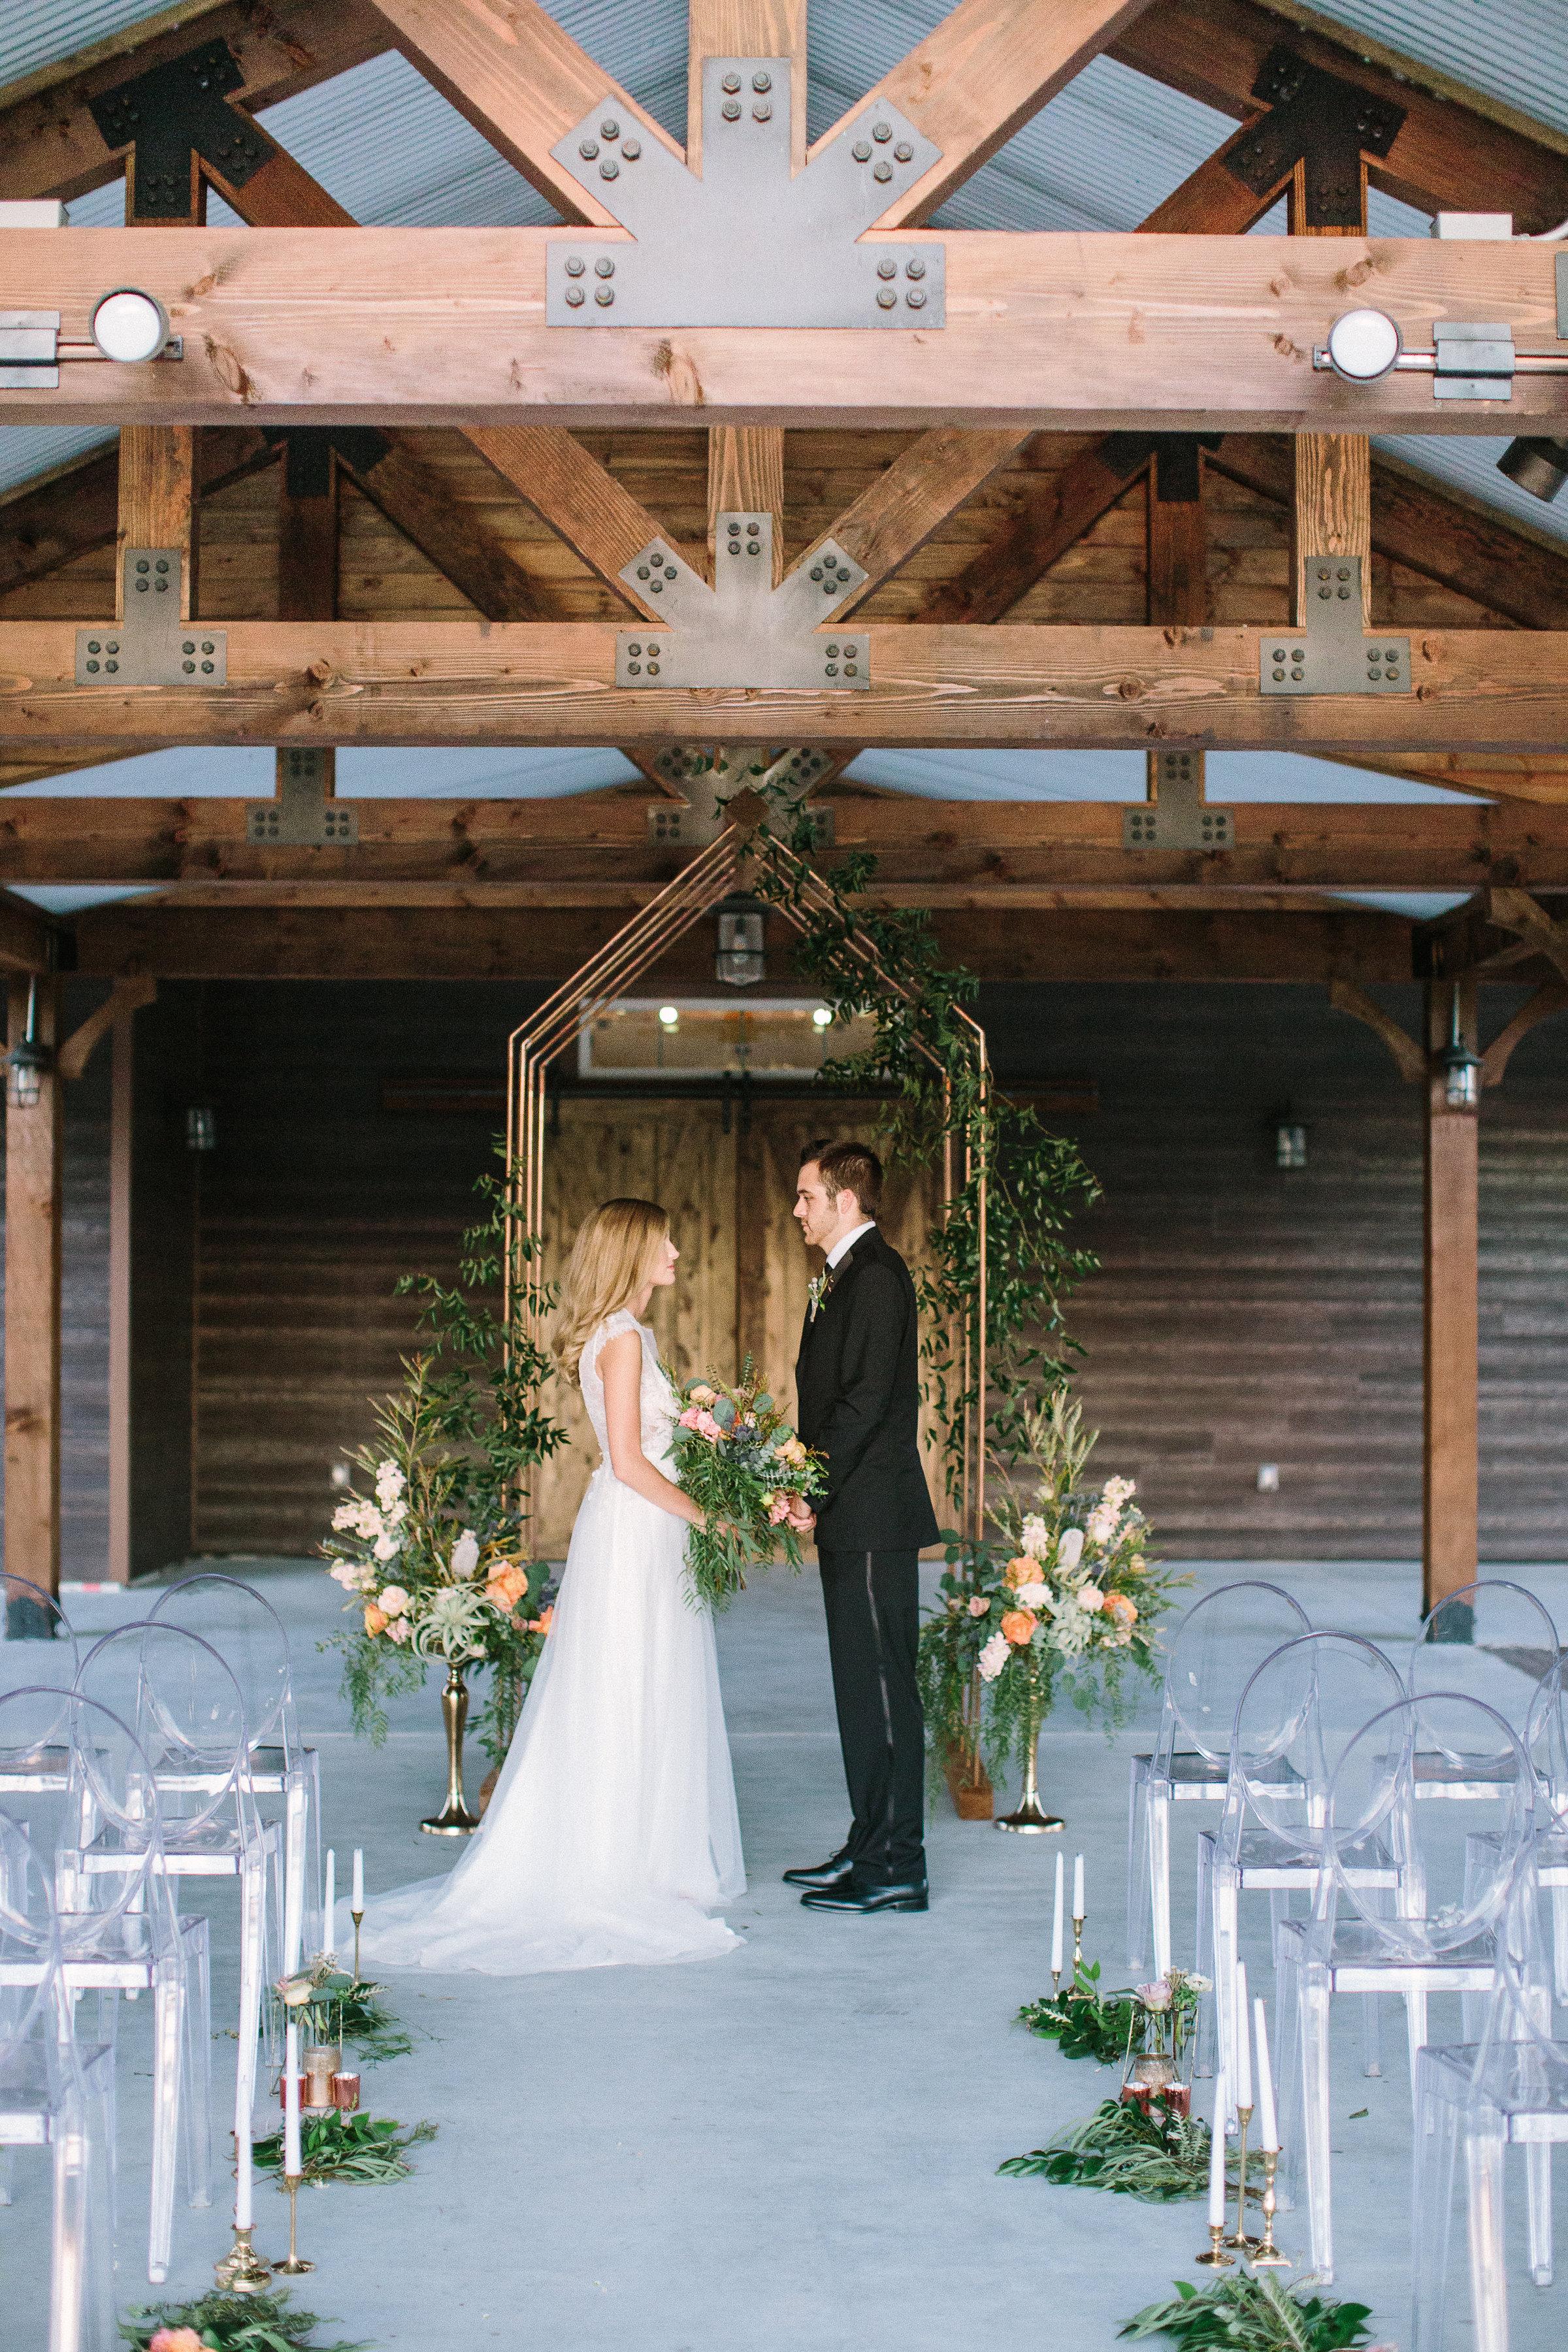 Ellen-Ashton-Photography-Peach-Creek-Ranch-Weddings-Wed-and-Prosper379